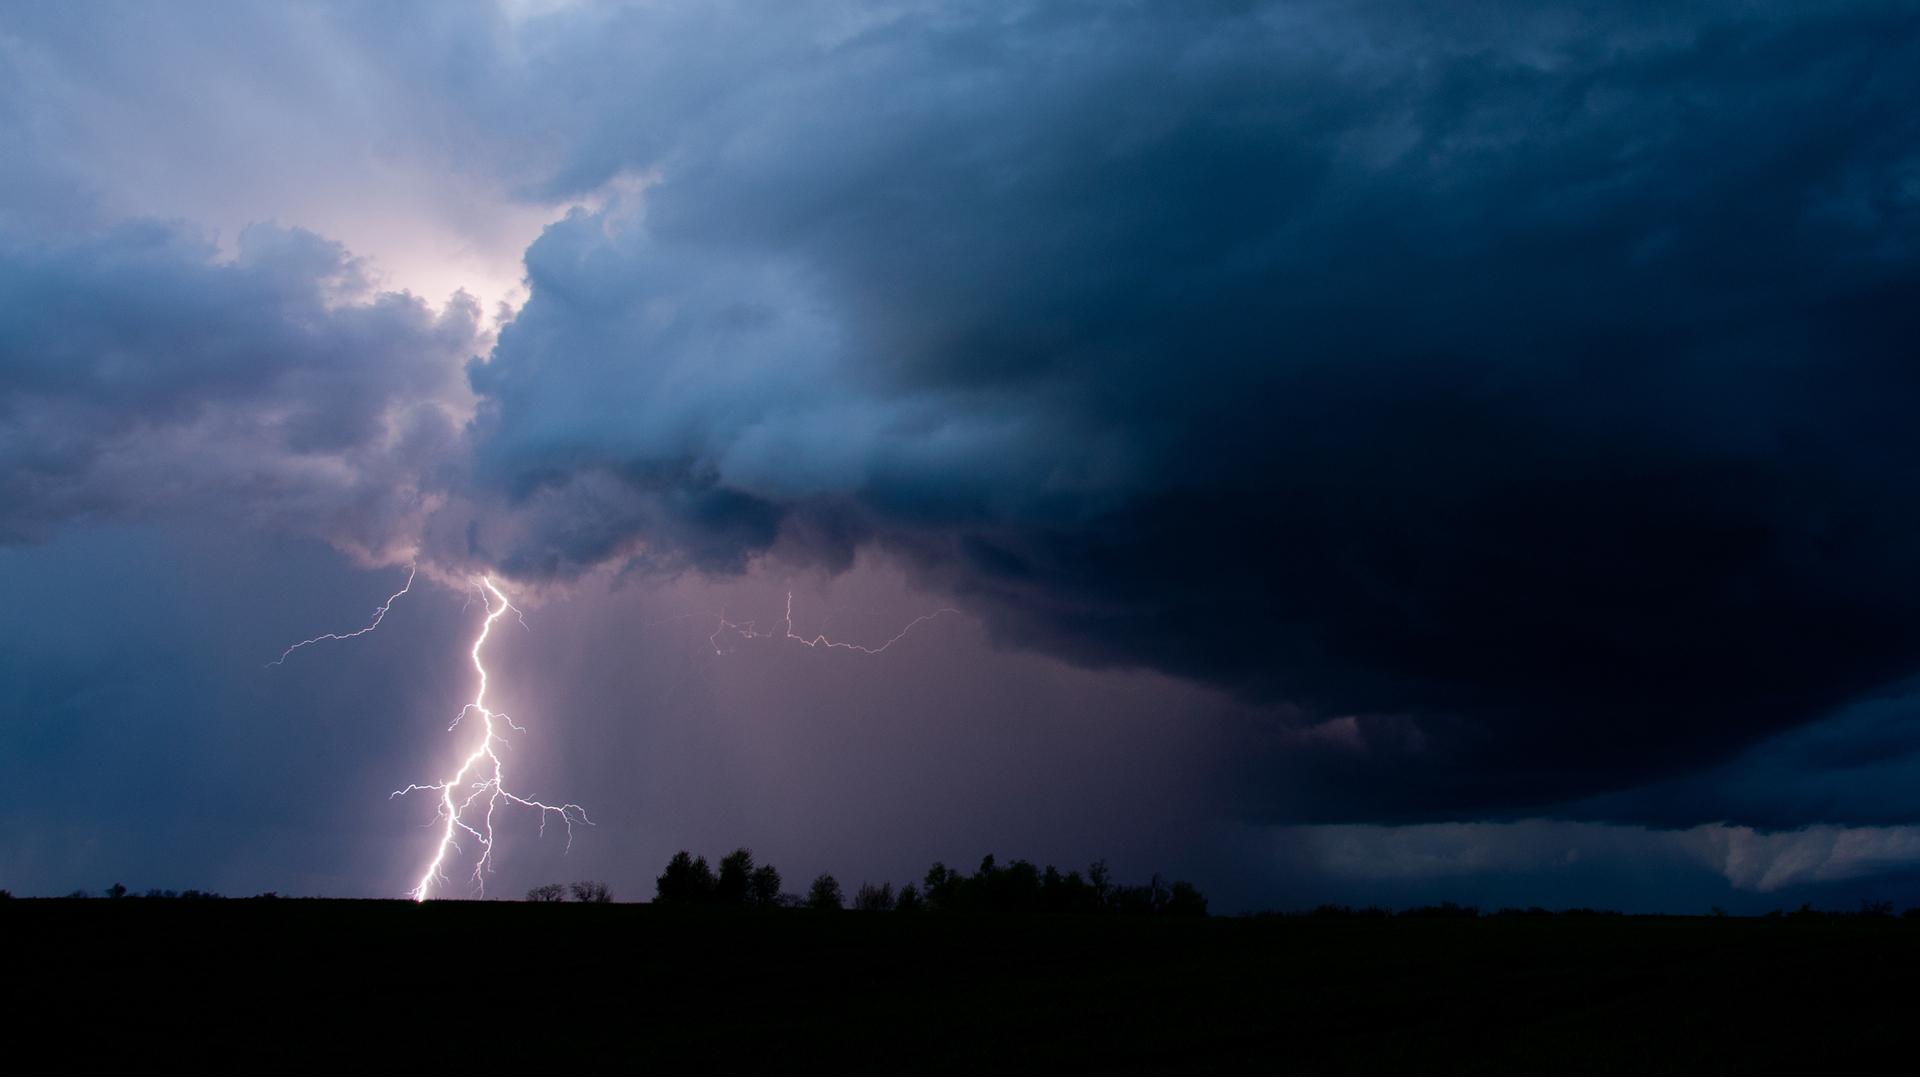 The perfect regulatory reform storm